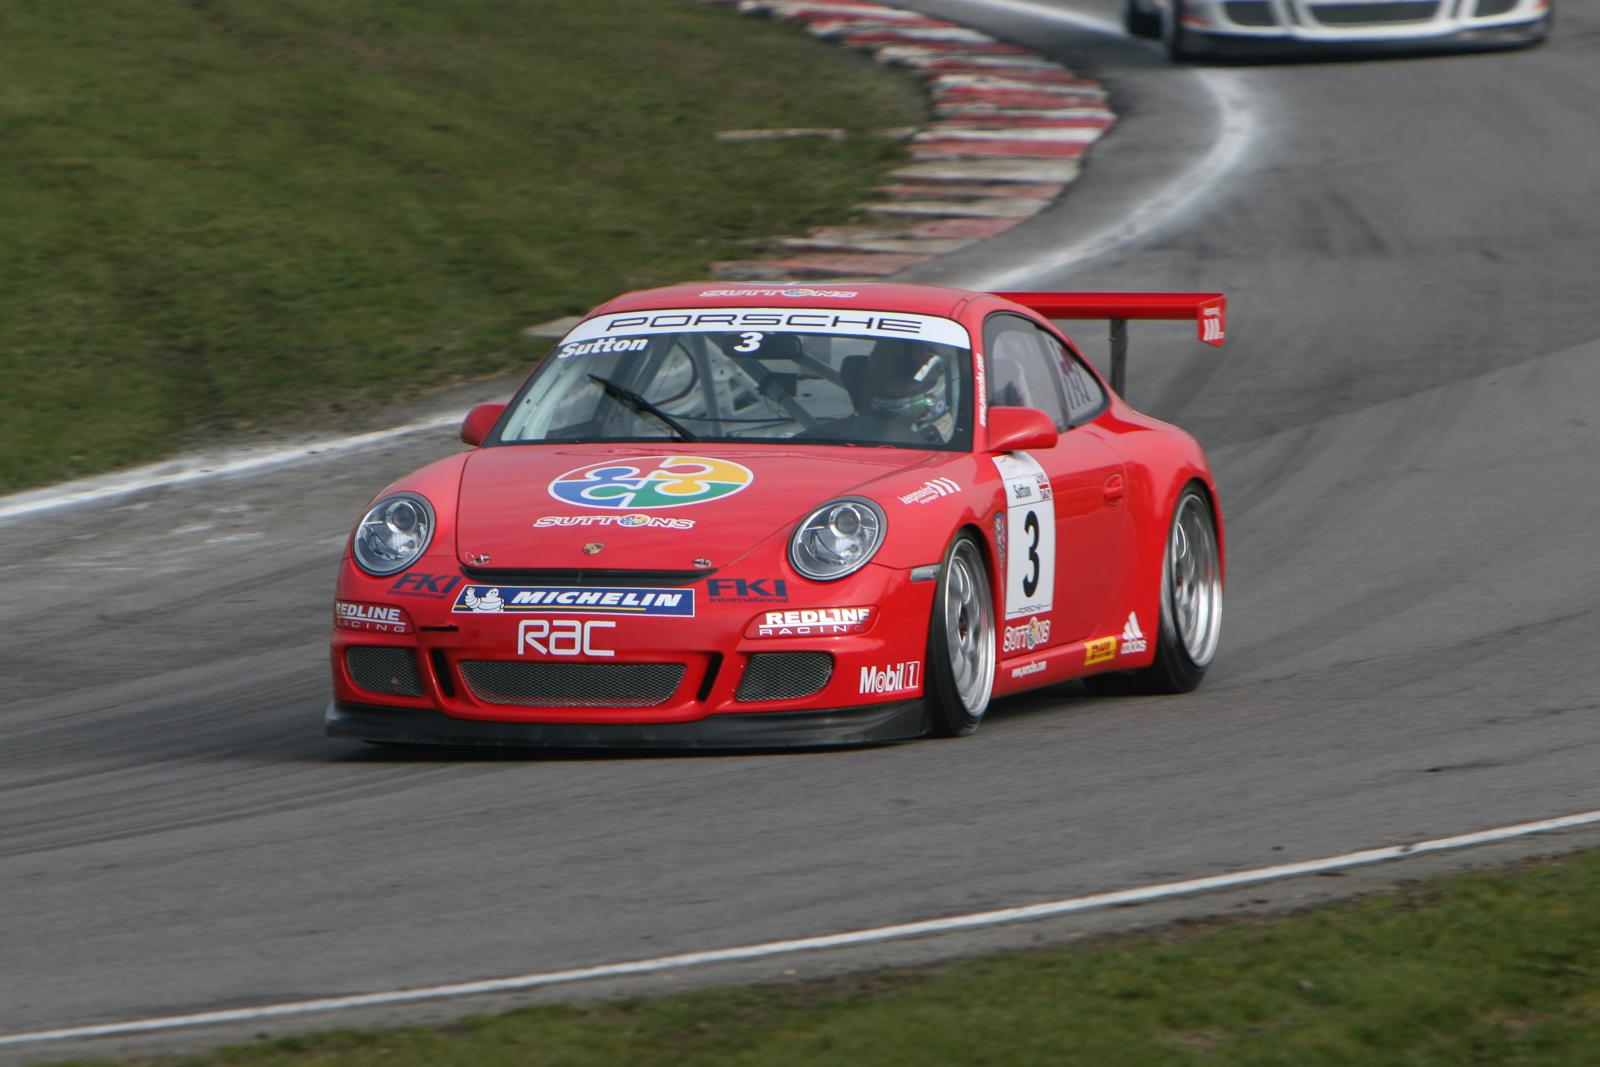 20070331 - BTCC Brands -070331 -010